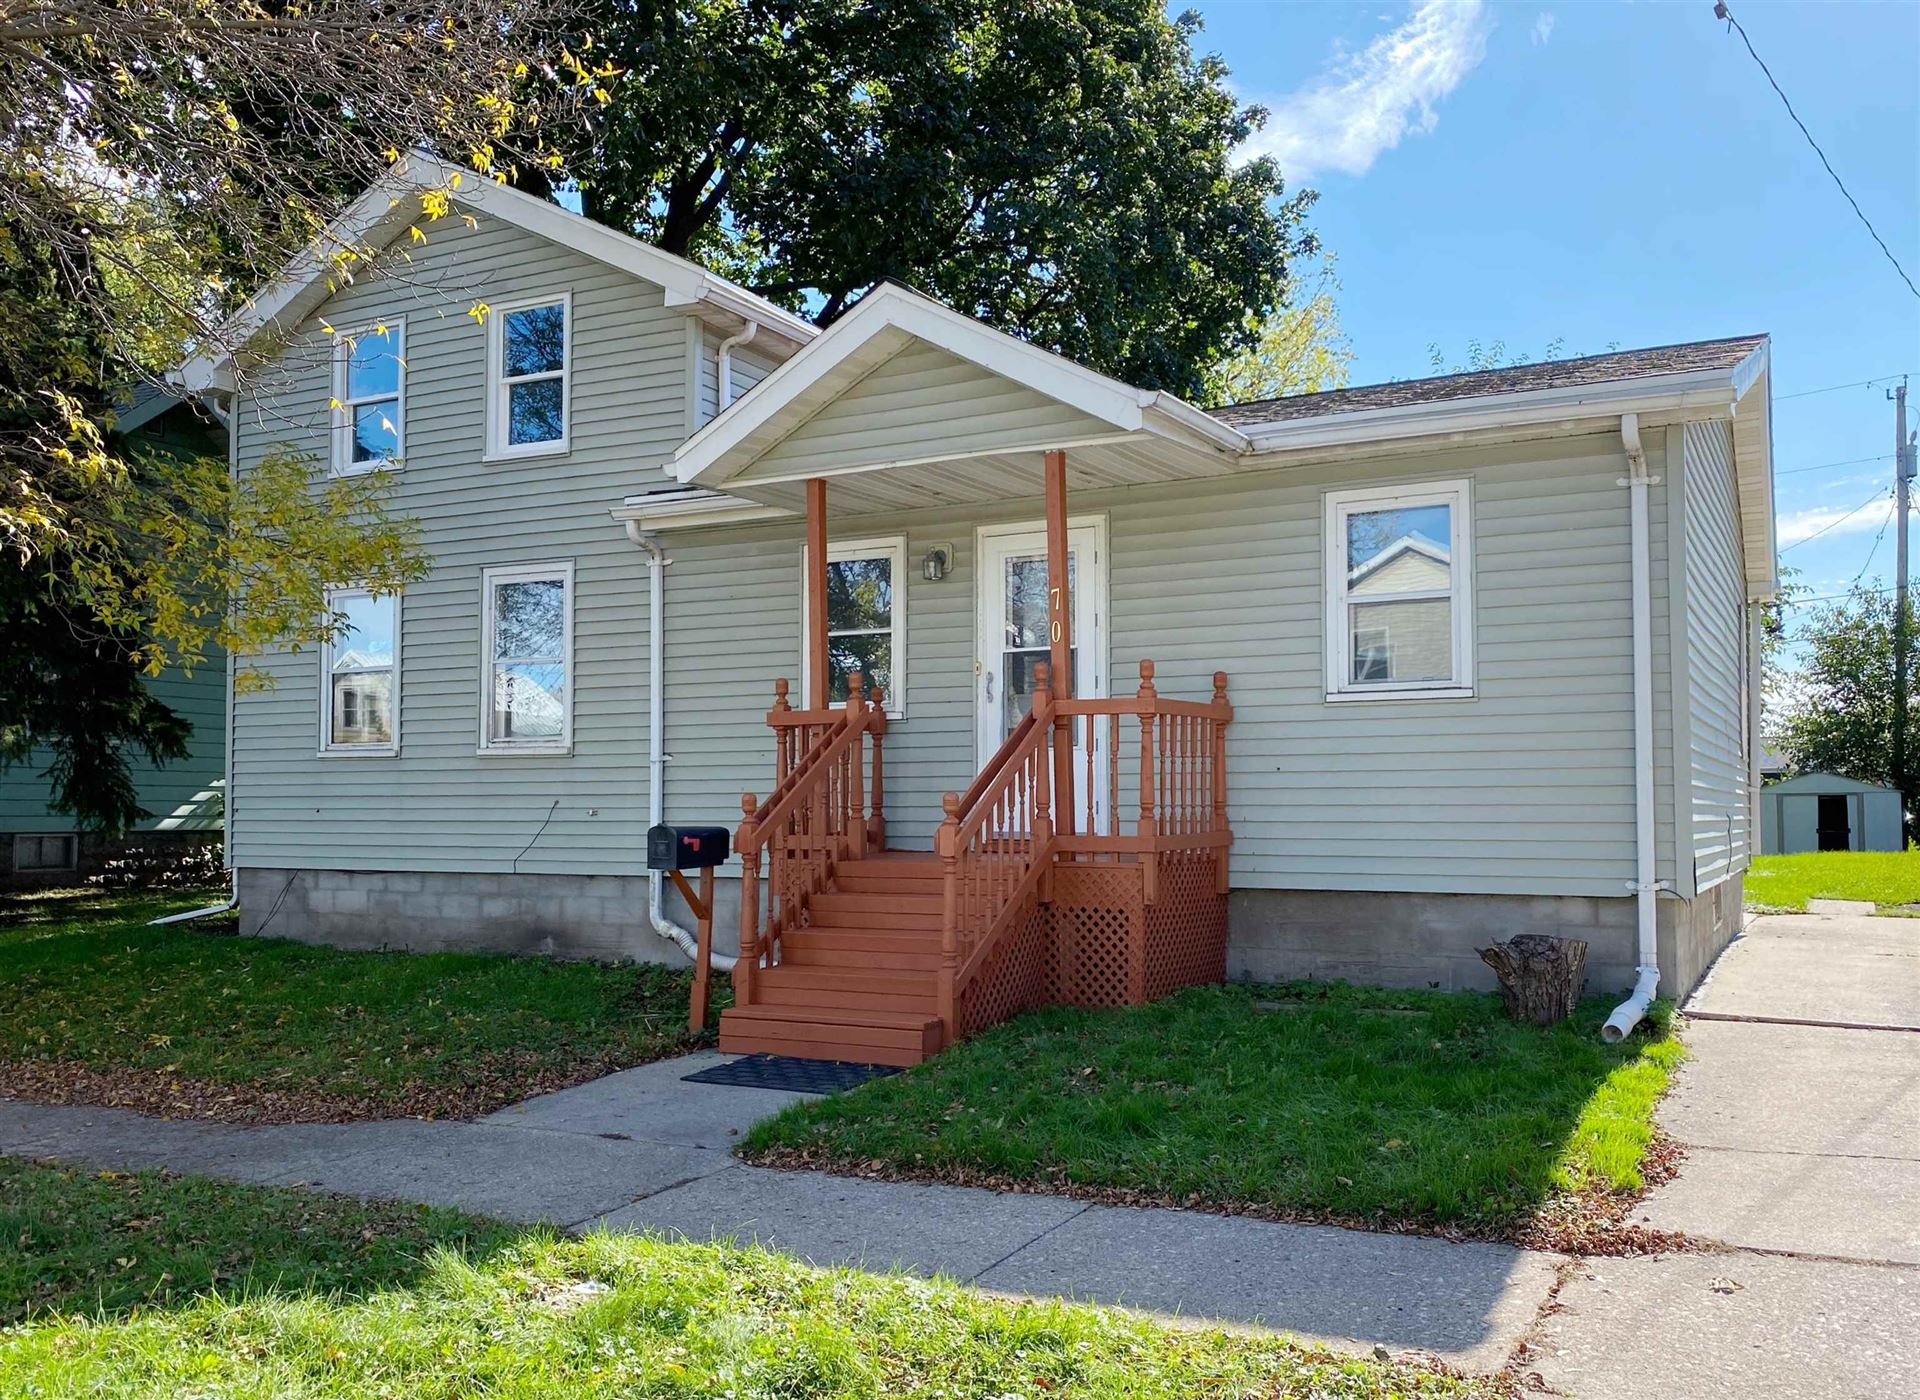 70 SIBLEY Street, Fond du Lac, WI 54935 - MLS#: 50249925